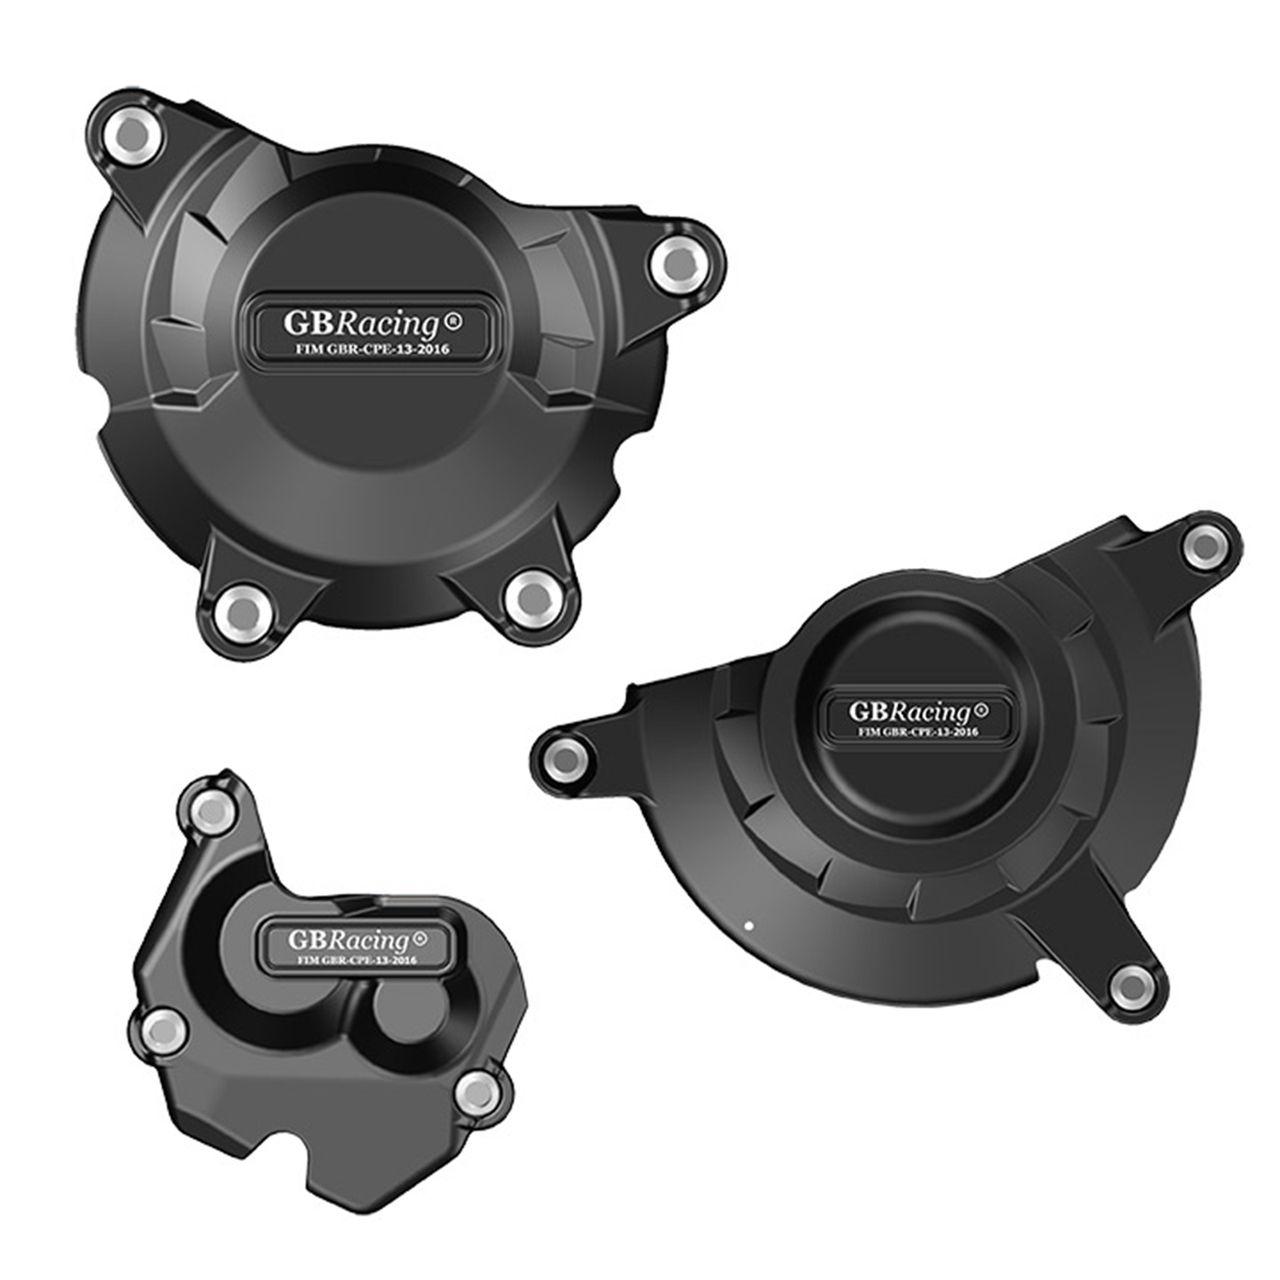 Engine Case Cover Protector Slider Set Kawasaki ZX10R 2011 2016 Black